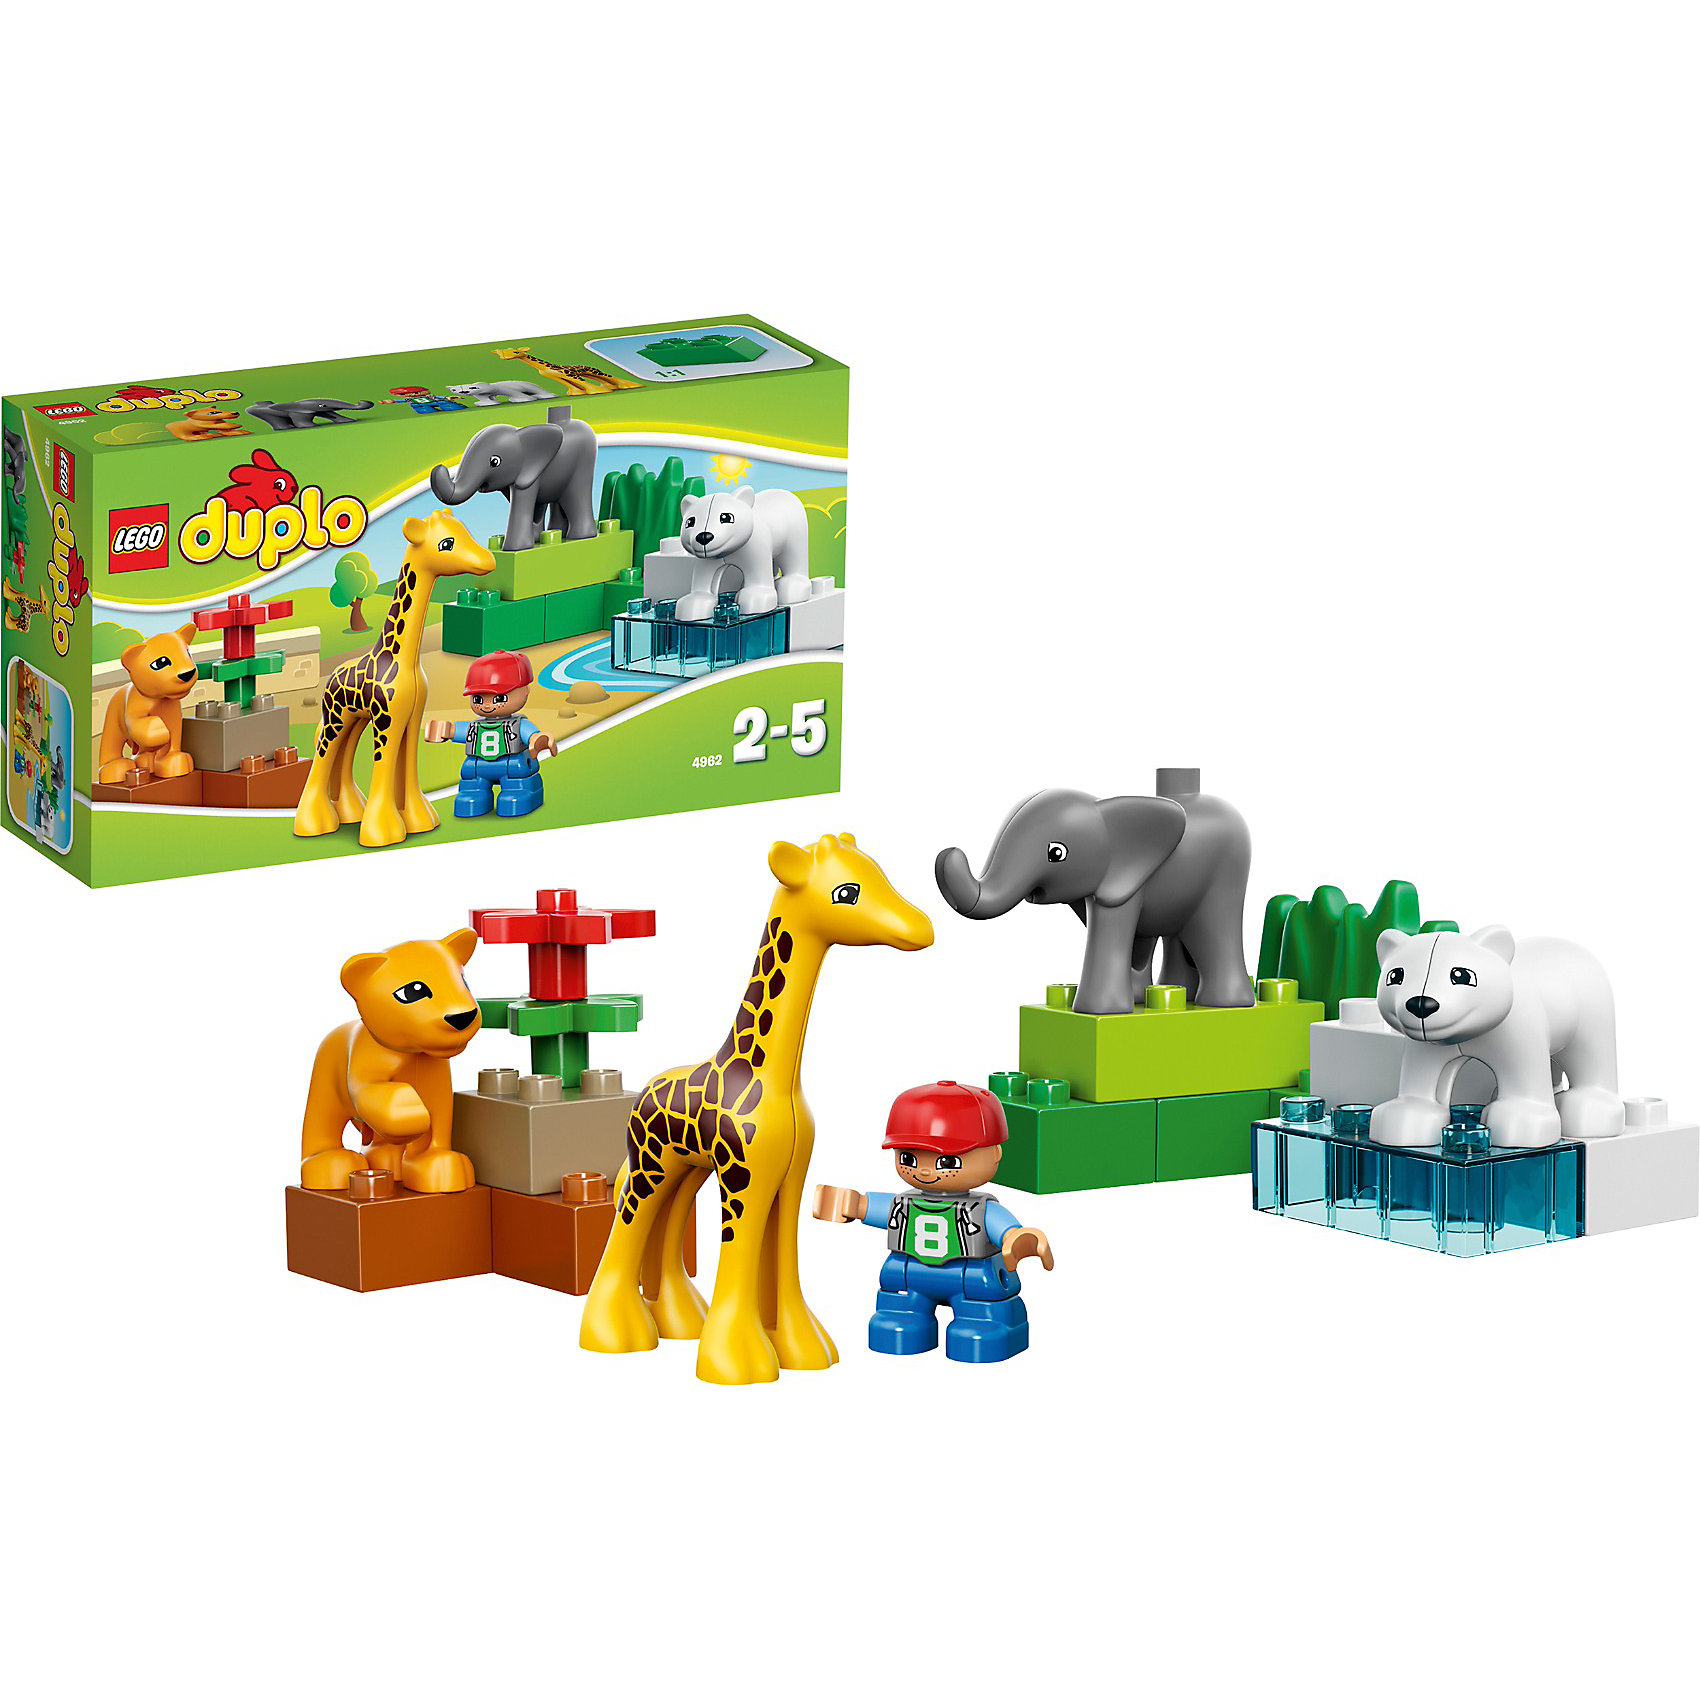 LEGO DUPLO 4962 Ville: ������� ��� ��������������� ����� DUPLO Ville ������� ��� ������� (LEGO � 4962) �� ���� ������� � ���������� ����� ������� ��������� �������� ��� ����� � ���.     <br><br>��������� �������� ����� ����� ������ � ��������. �������������� ������ ���� ��������� ��������� �� ���������� ��������, ��������� ����������� � ��������.     <br>      <br>�����������:    <br>      <br>- 4 ������� ��������� ��������  <br>- 1 ������� ���������� ��������<br>          <br>�������������� ����������:<br>      <br>- LEGO-������� � 4962<br>- �������:  �� 2 �� 5 ���<br>- ���������� ������� LEGO: 18<br>    <br>LEGO DUPLO 4962 Ville: ������� ��� ������� ����� ������ � ����� ��������.<br><br>������ ��: 266<br>������� ��: 144<br>������ ��: 76<br>��� �: 285<br>������� �� �������: 24<br>������� �� �������: 60<br>���: �������<br>�������: �������<br>SKU: 1492738